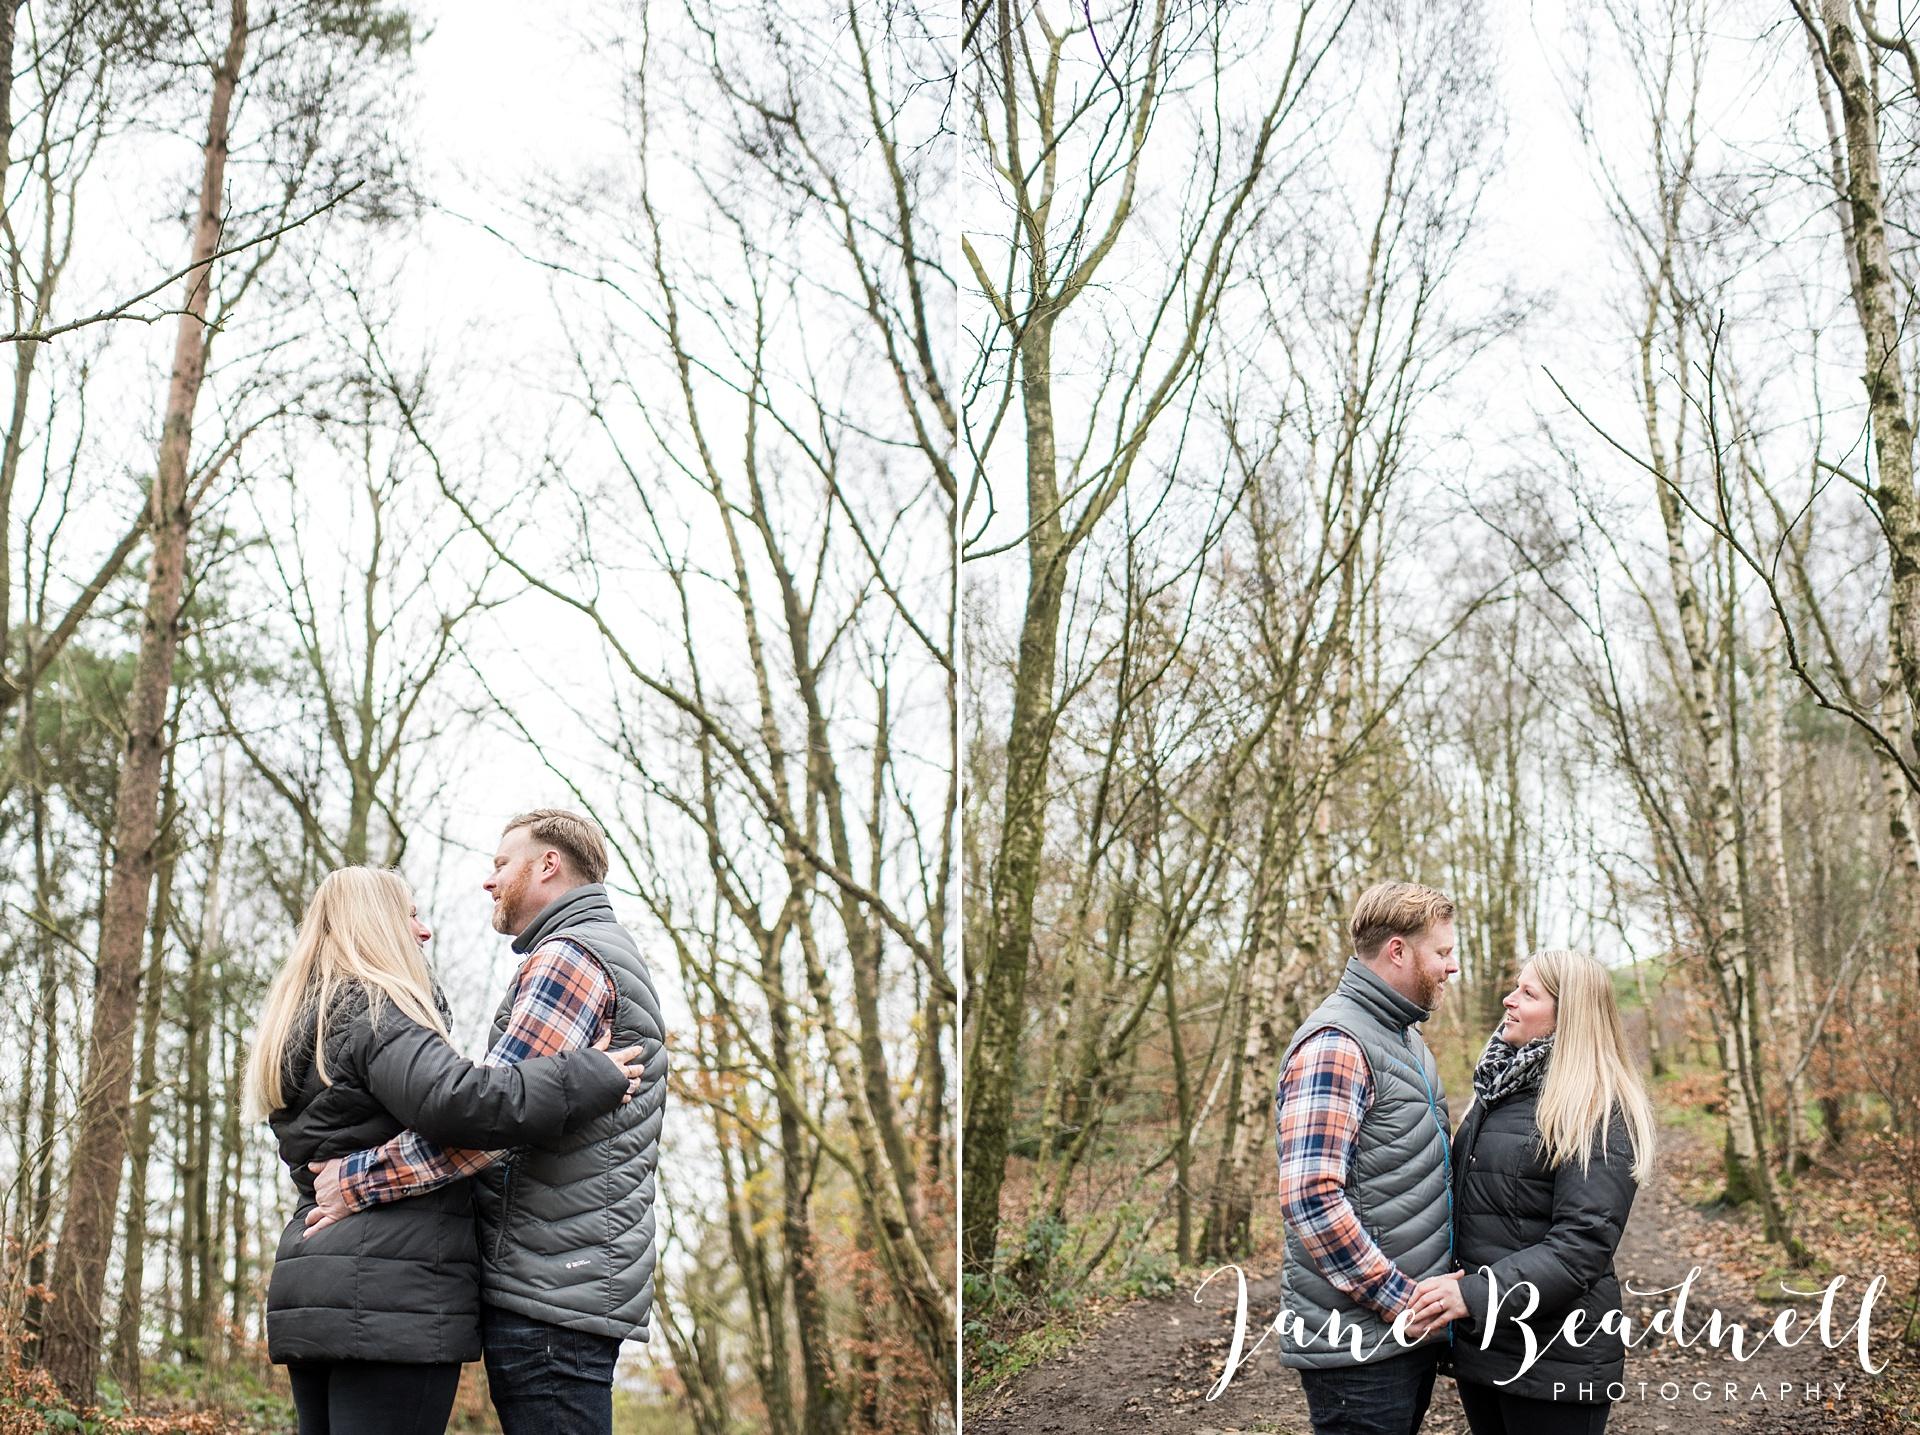 yorkshire-wedding-photographer-jane-beadnell-photography-uk-and-destination-wedding-photographer-engagement-shoot_0016